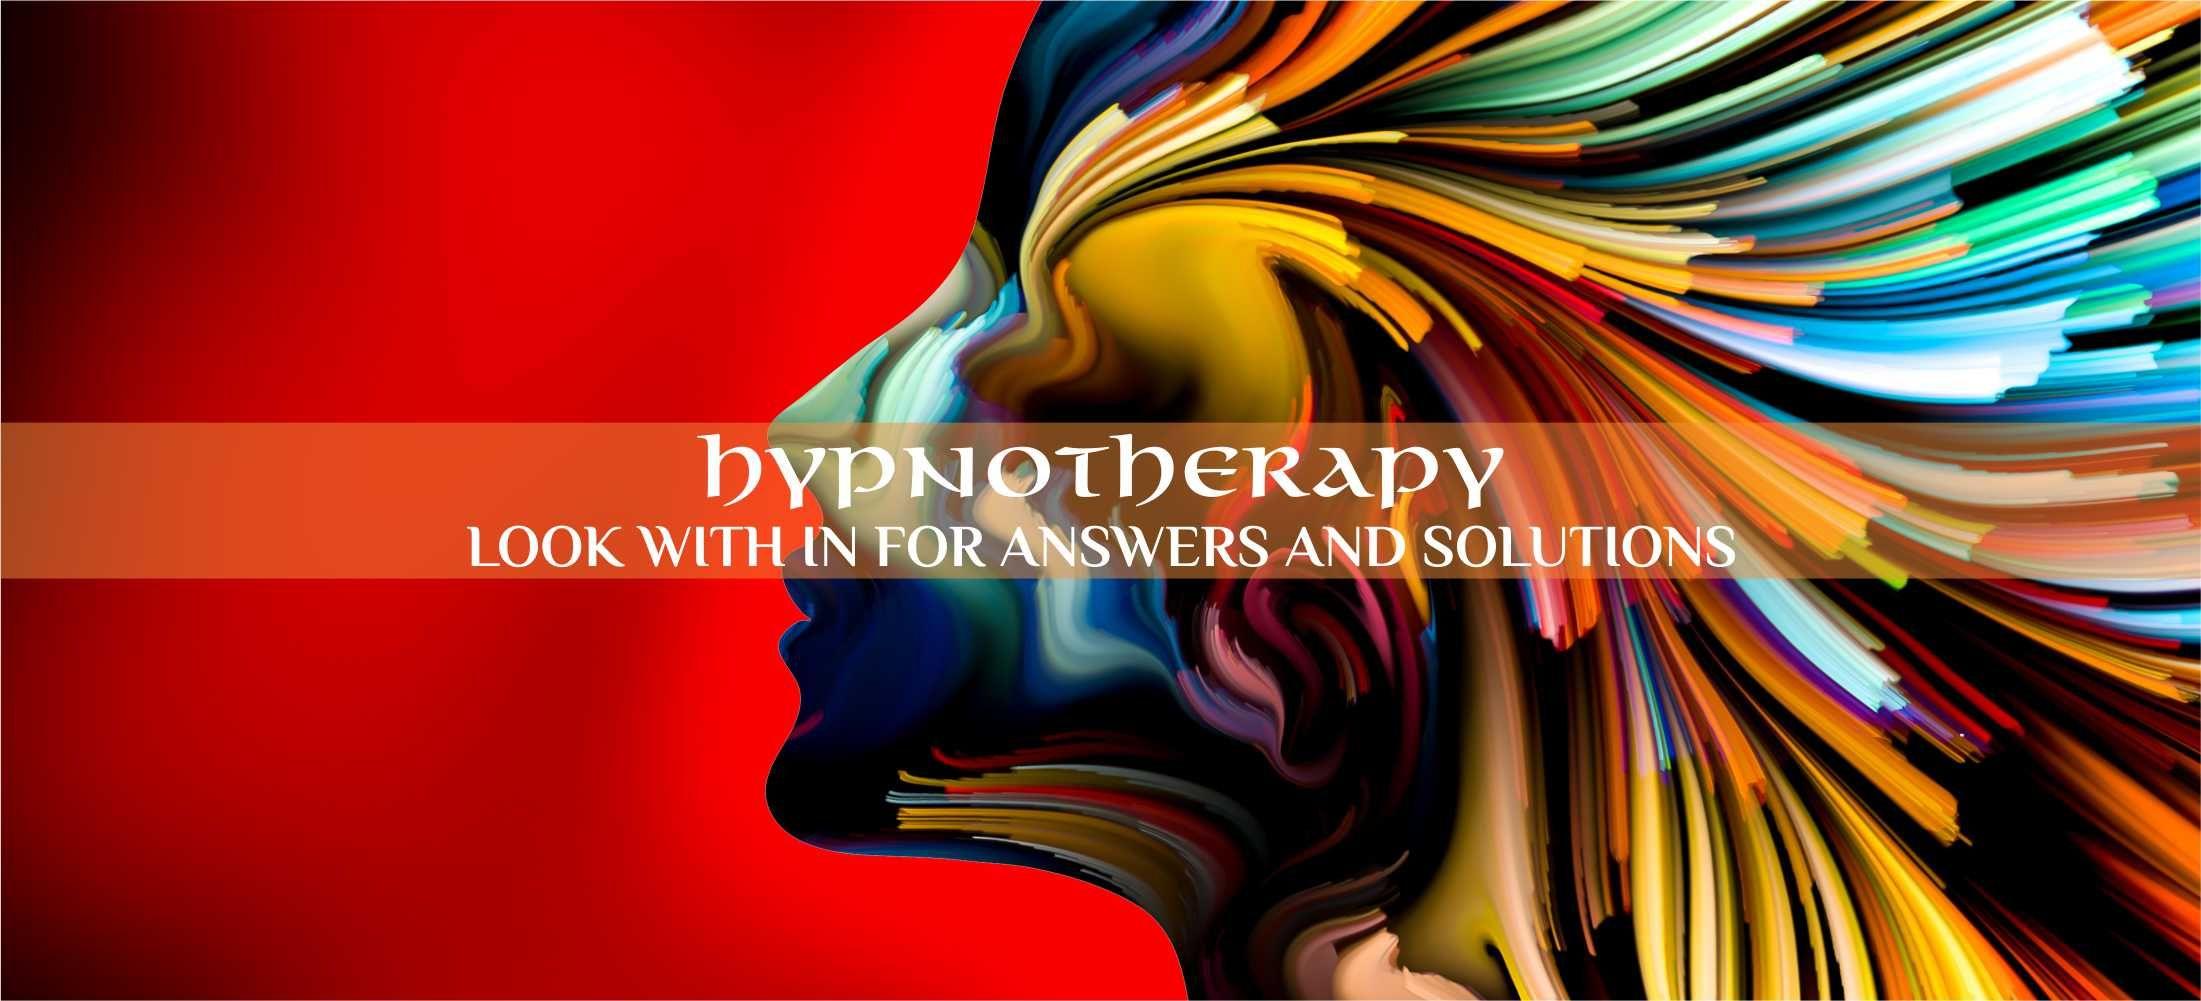 Hypnotherapy - Holistic Ayurvedic Hypnotherapy Center ...